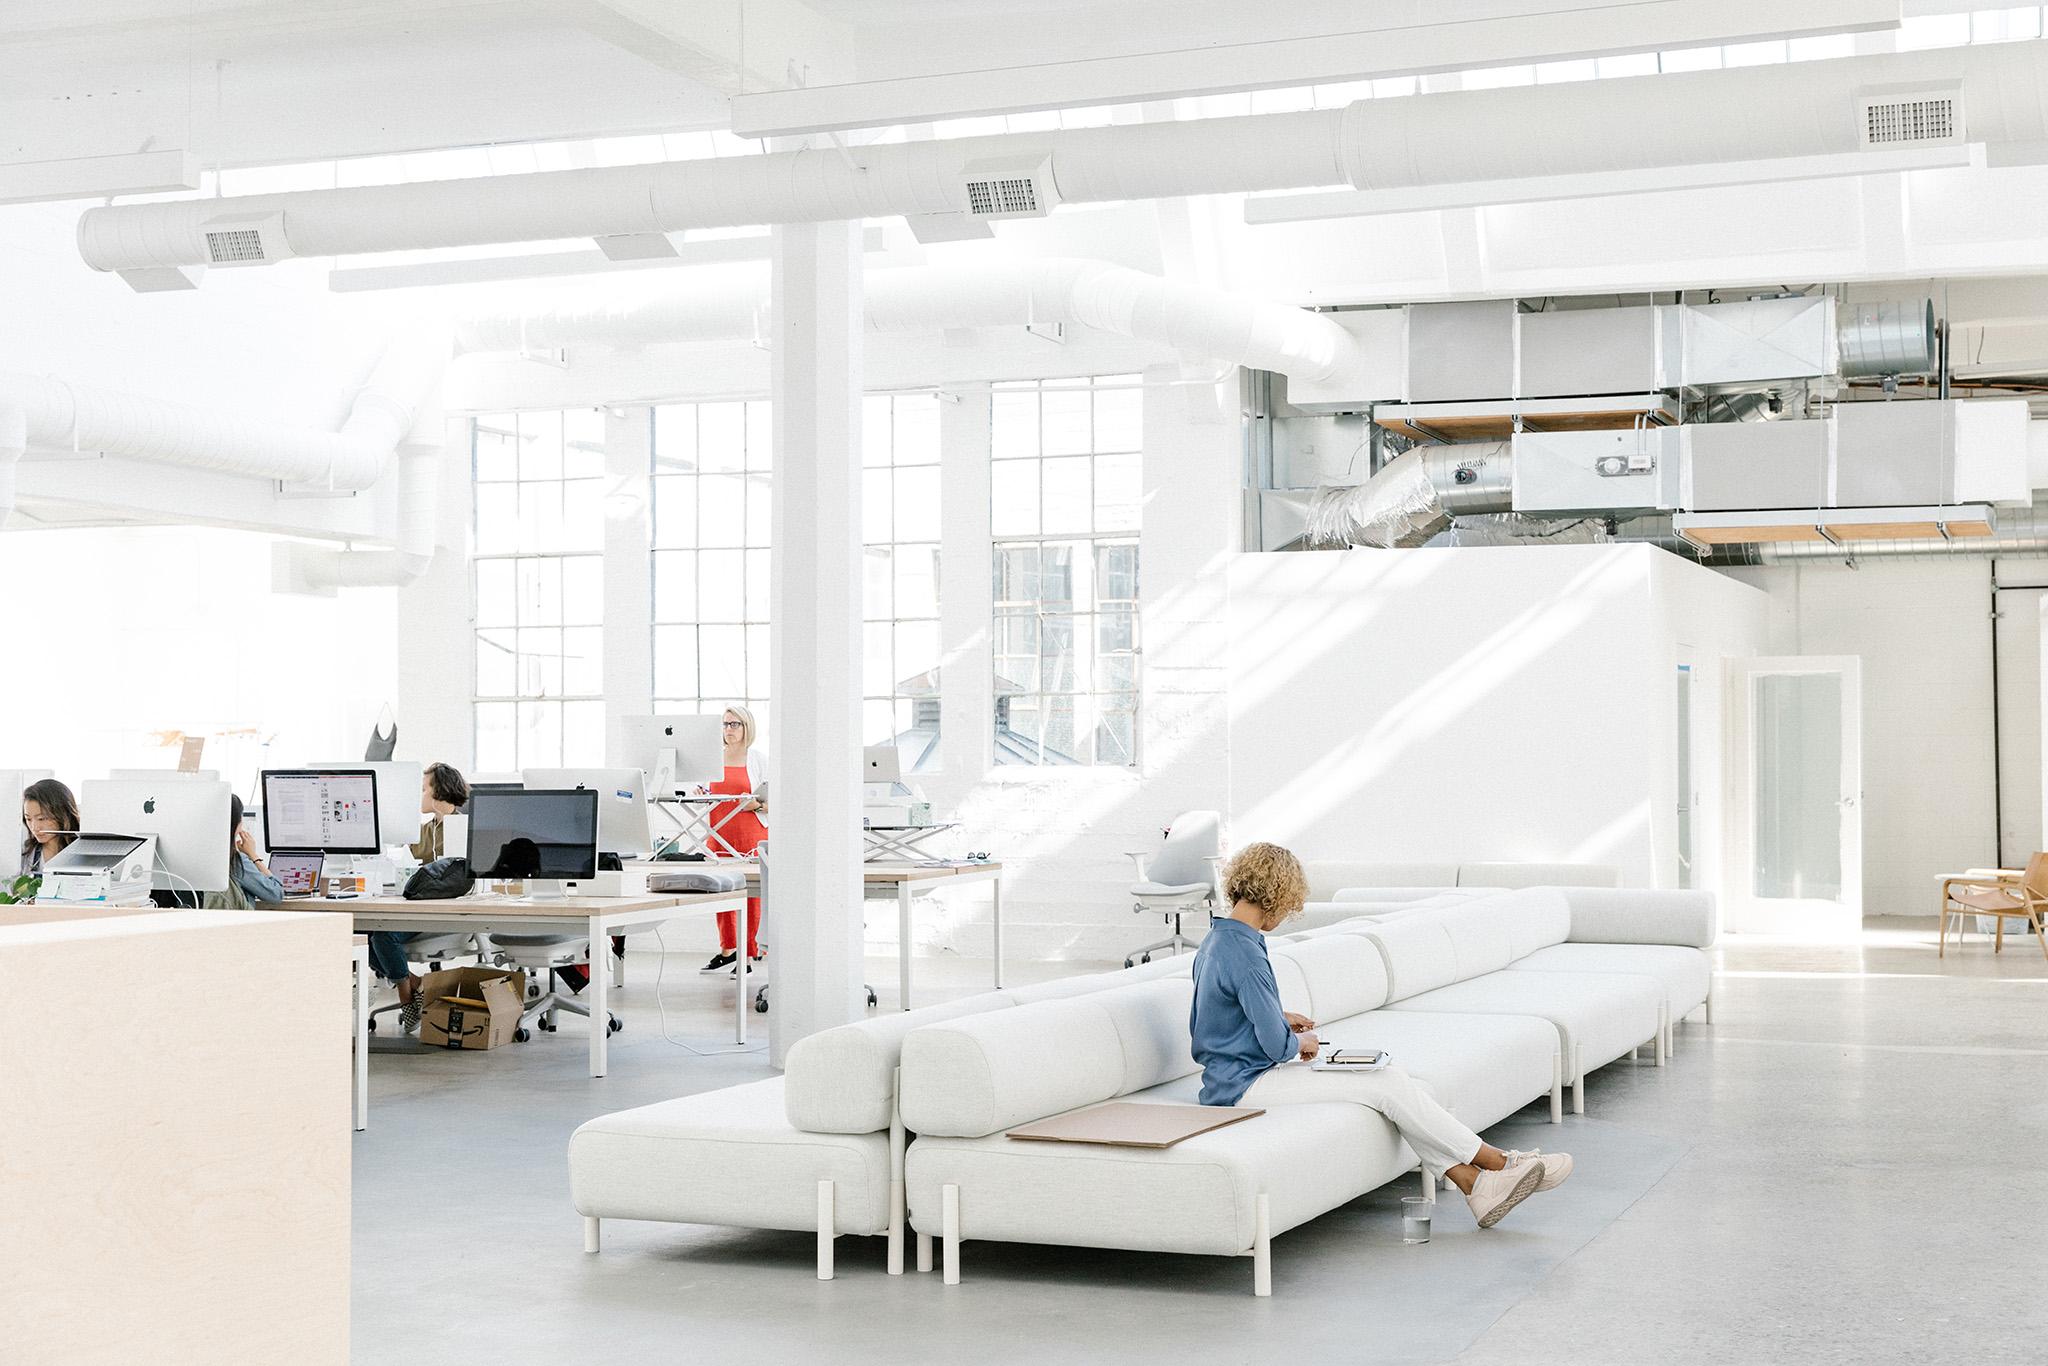 The Everlane headquarters in San Francisco, CA, June 7, 2019. Jason Henry for WWDInside the Everlane studio